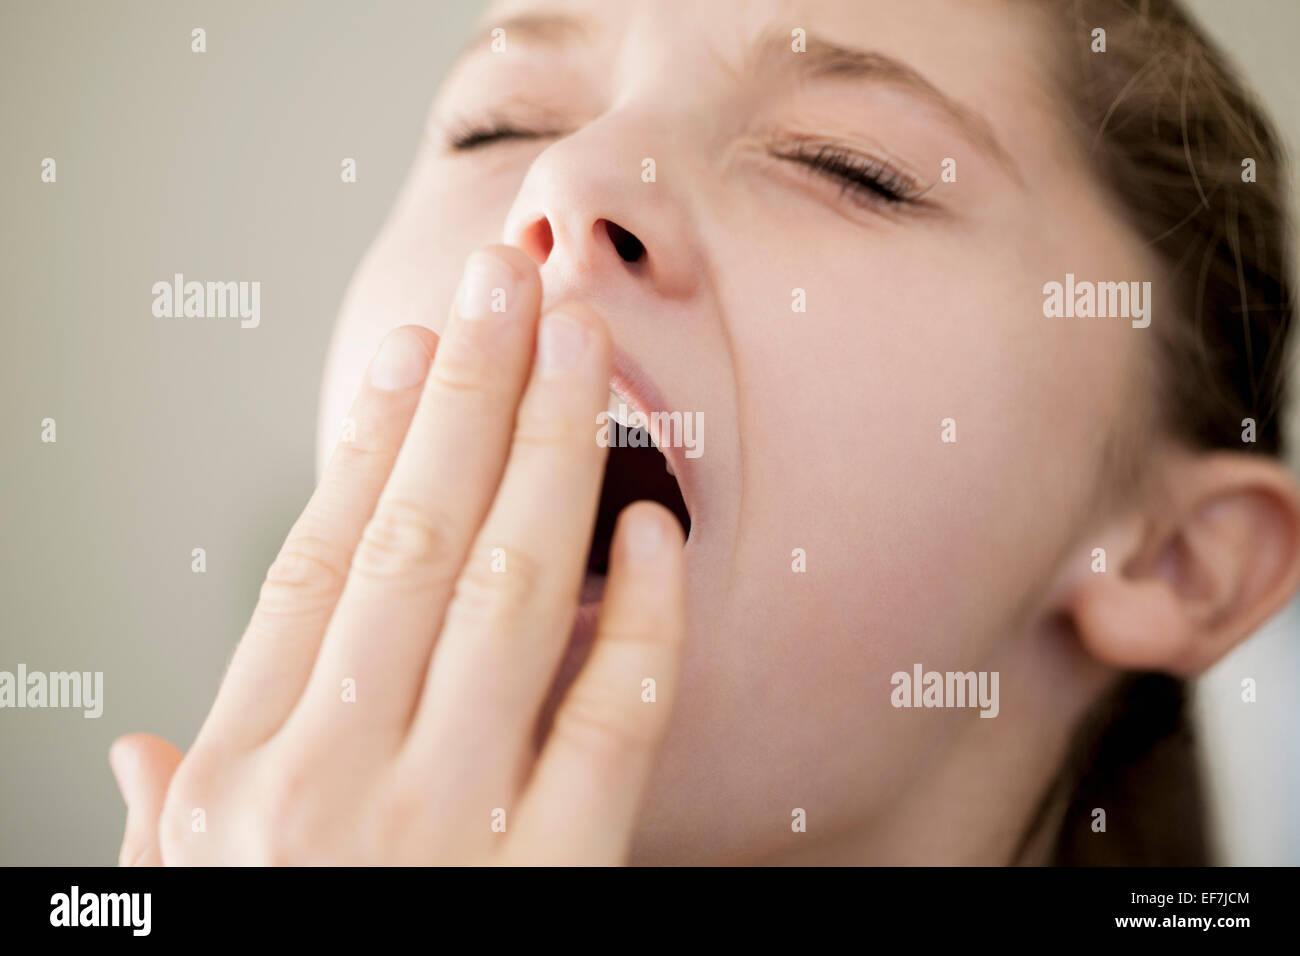 Close-up of a girl yawning - Stock Image